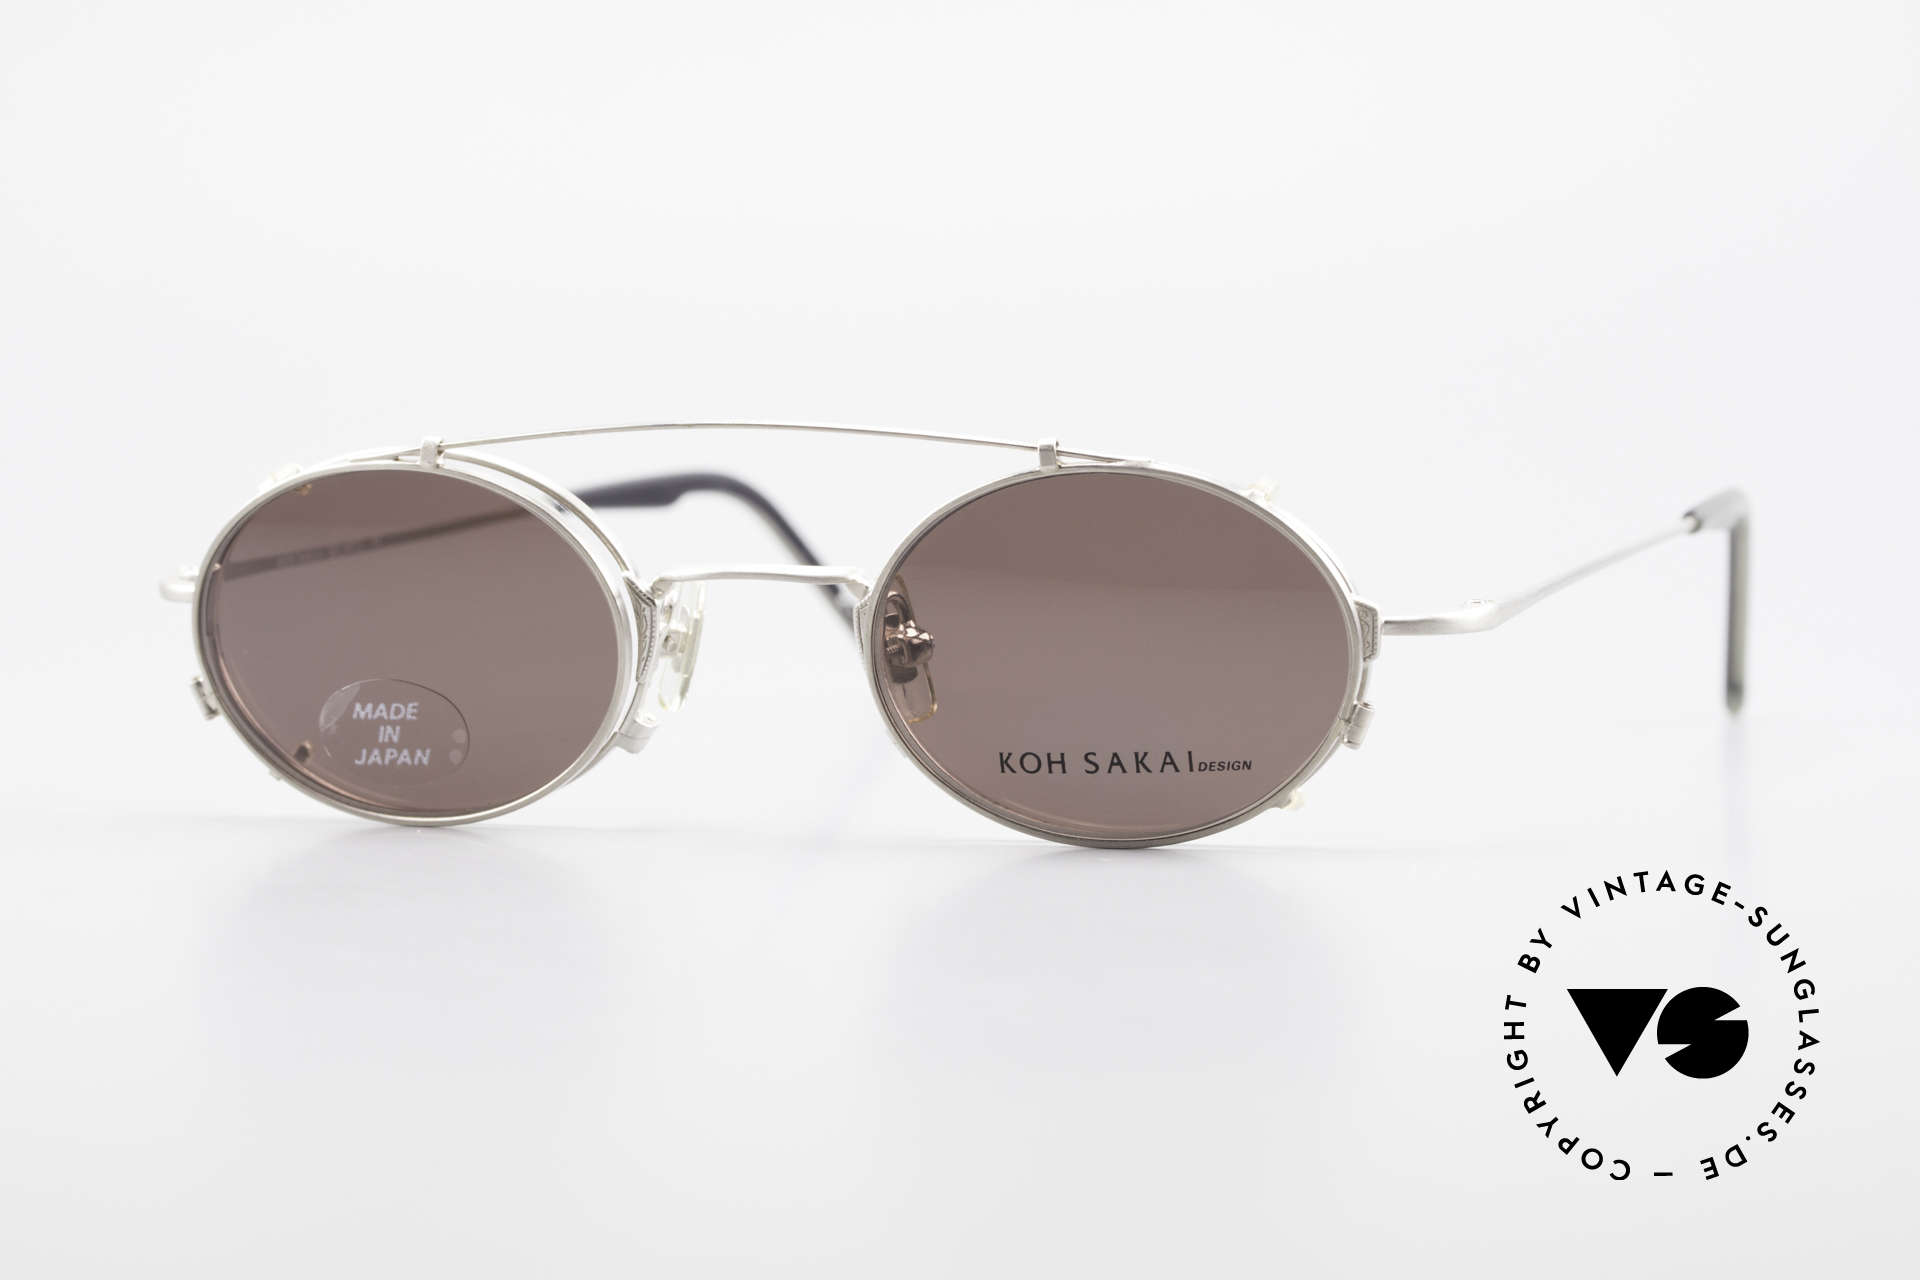 Koh Sakai KS9711 Small Oval Glasses Clip On, rare, vintage Koh Sakai glasses with clip-on from 1997, Made for Men and Women